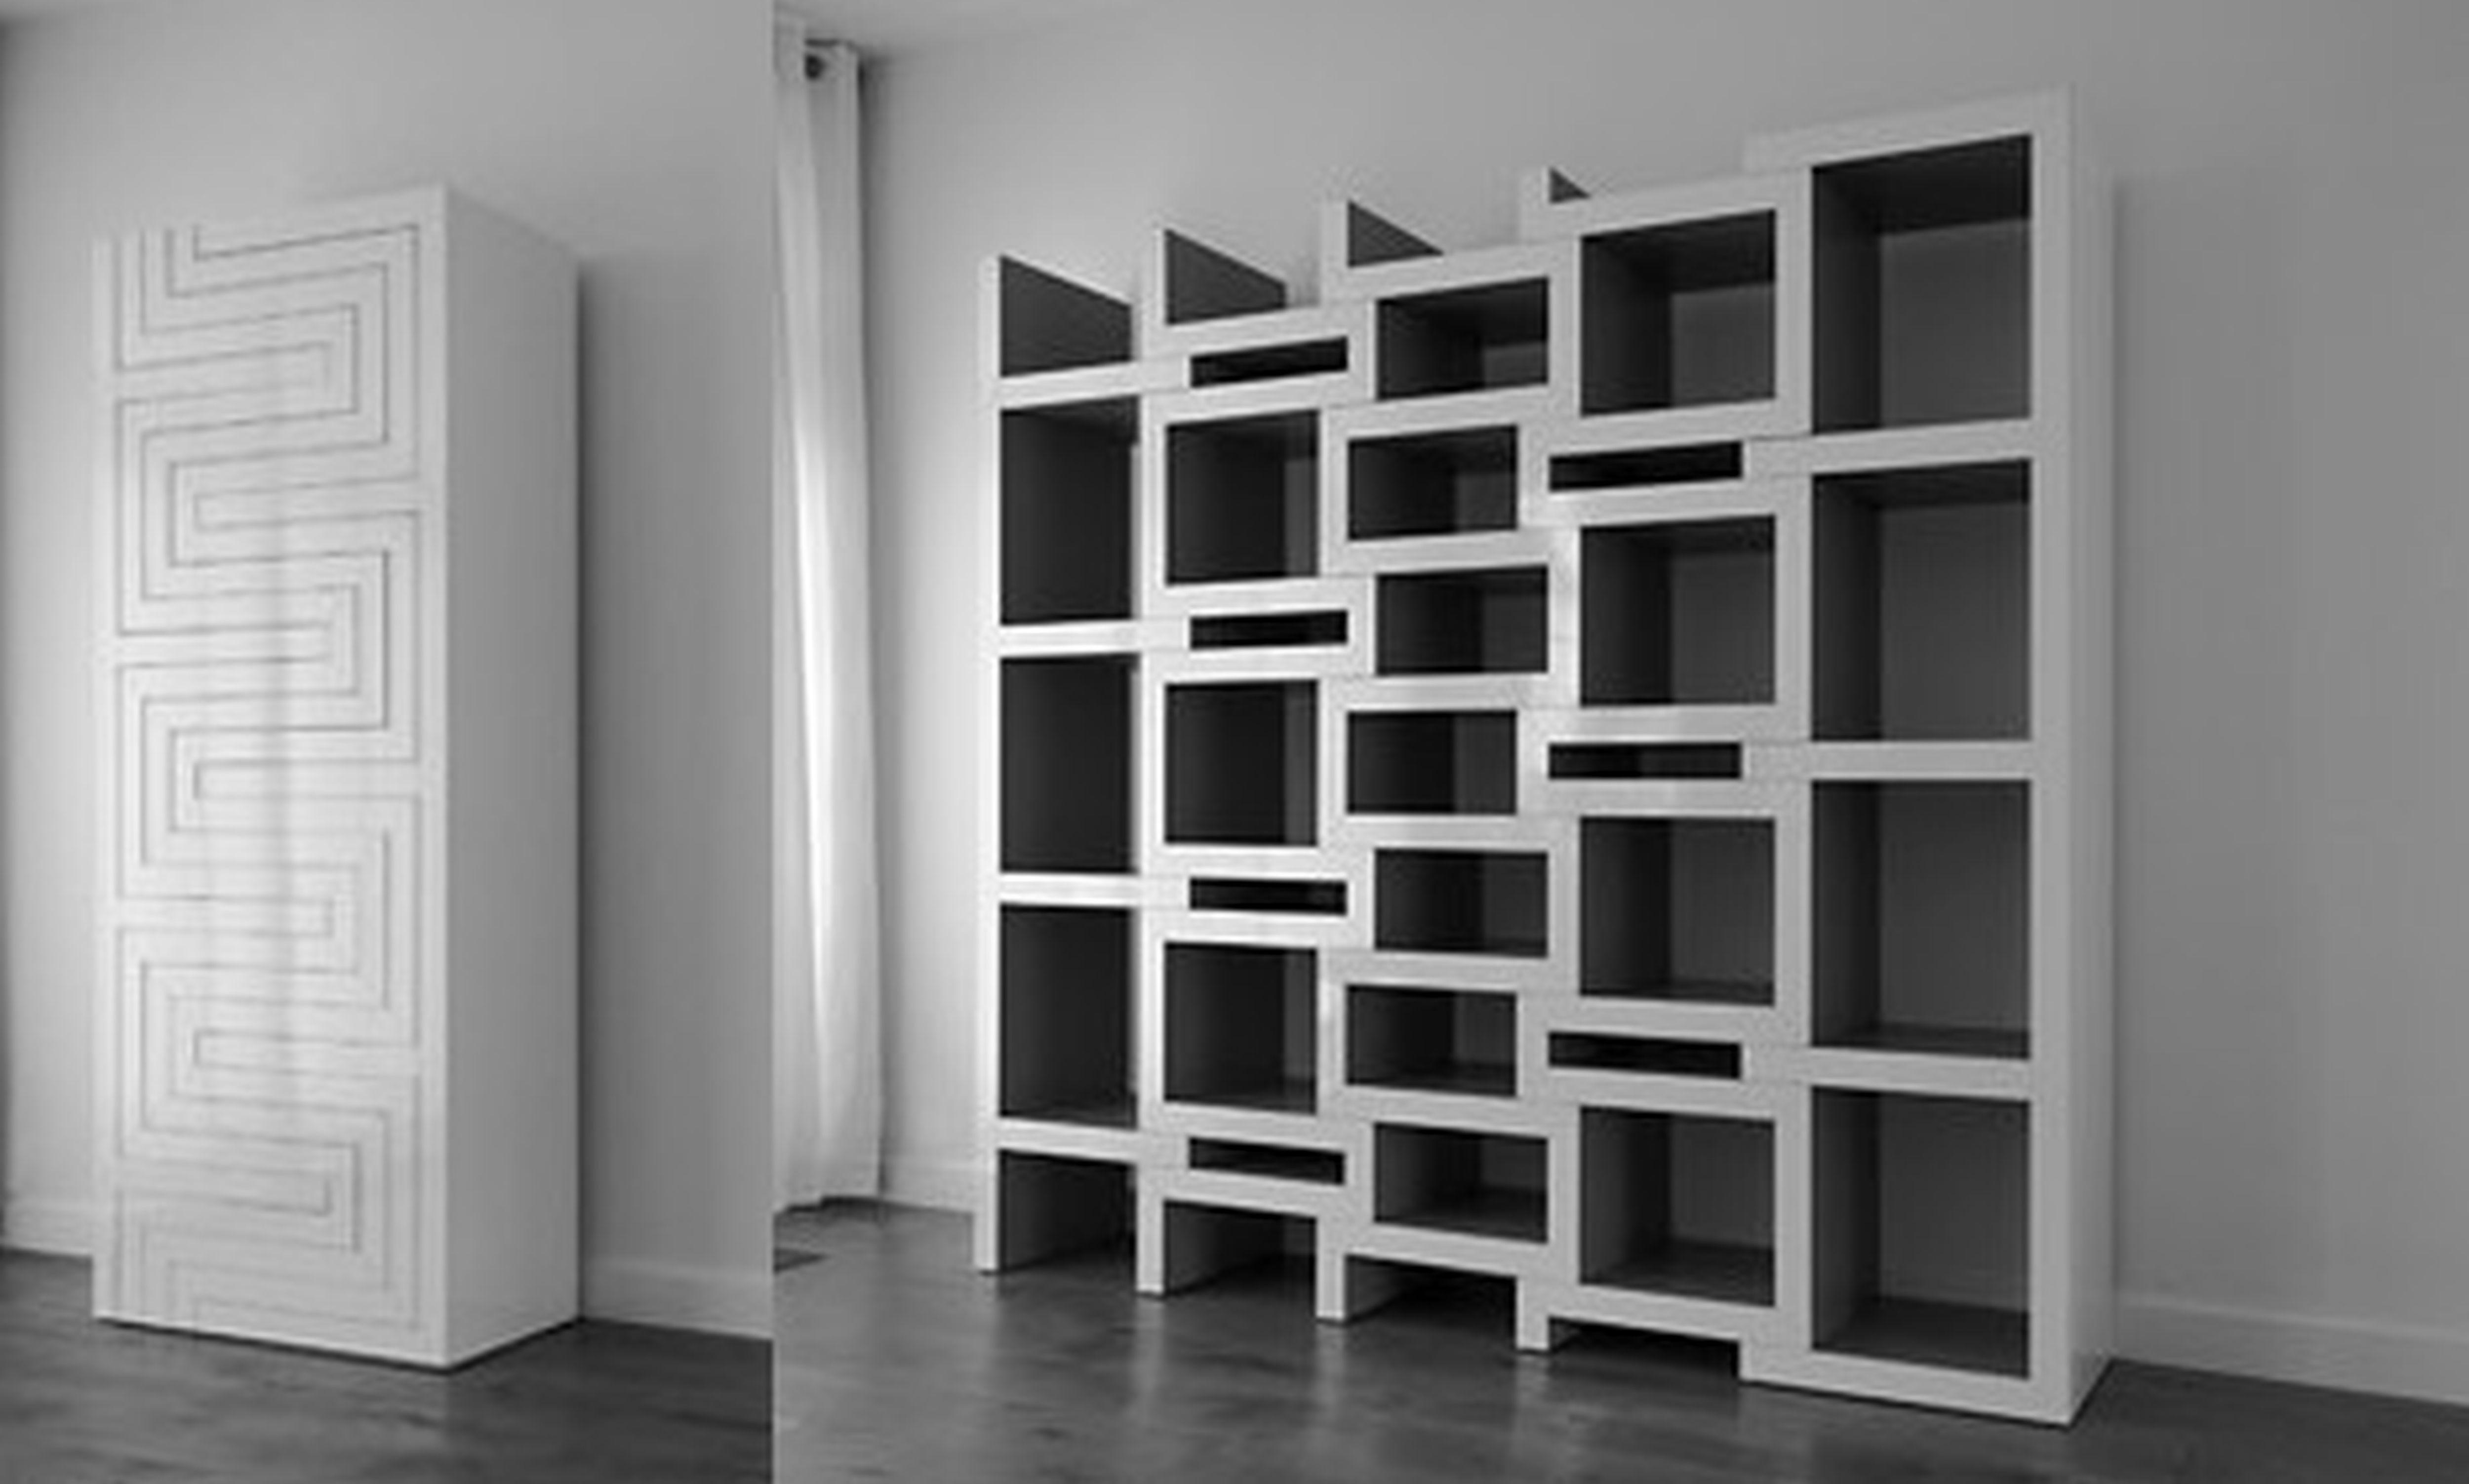 furniturefree standing unique ikea bookshelf on dark wooden  - expanding bookshelves  i love that the rek bookcase is an beautiful designas well as a functional piece of furniture reinier de jong has shaped the